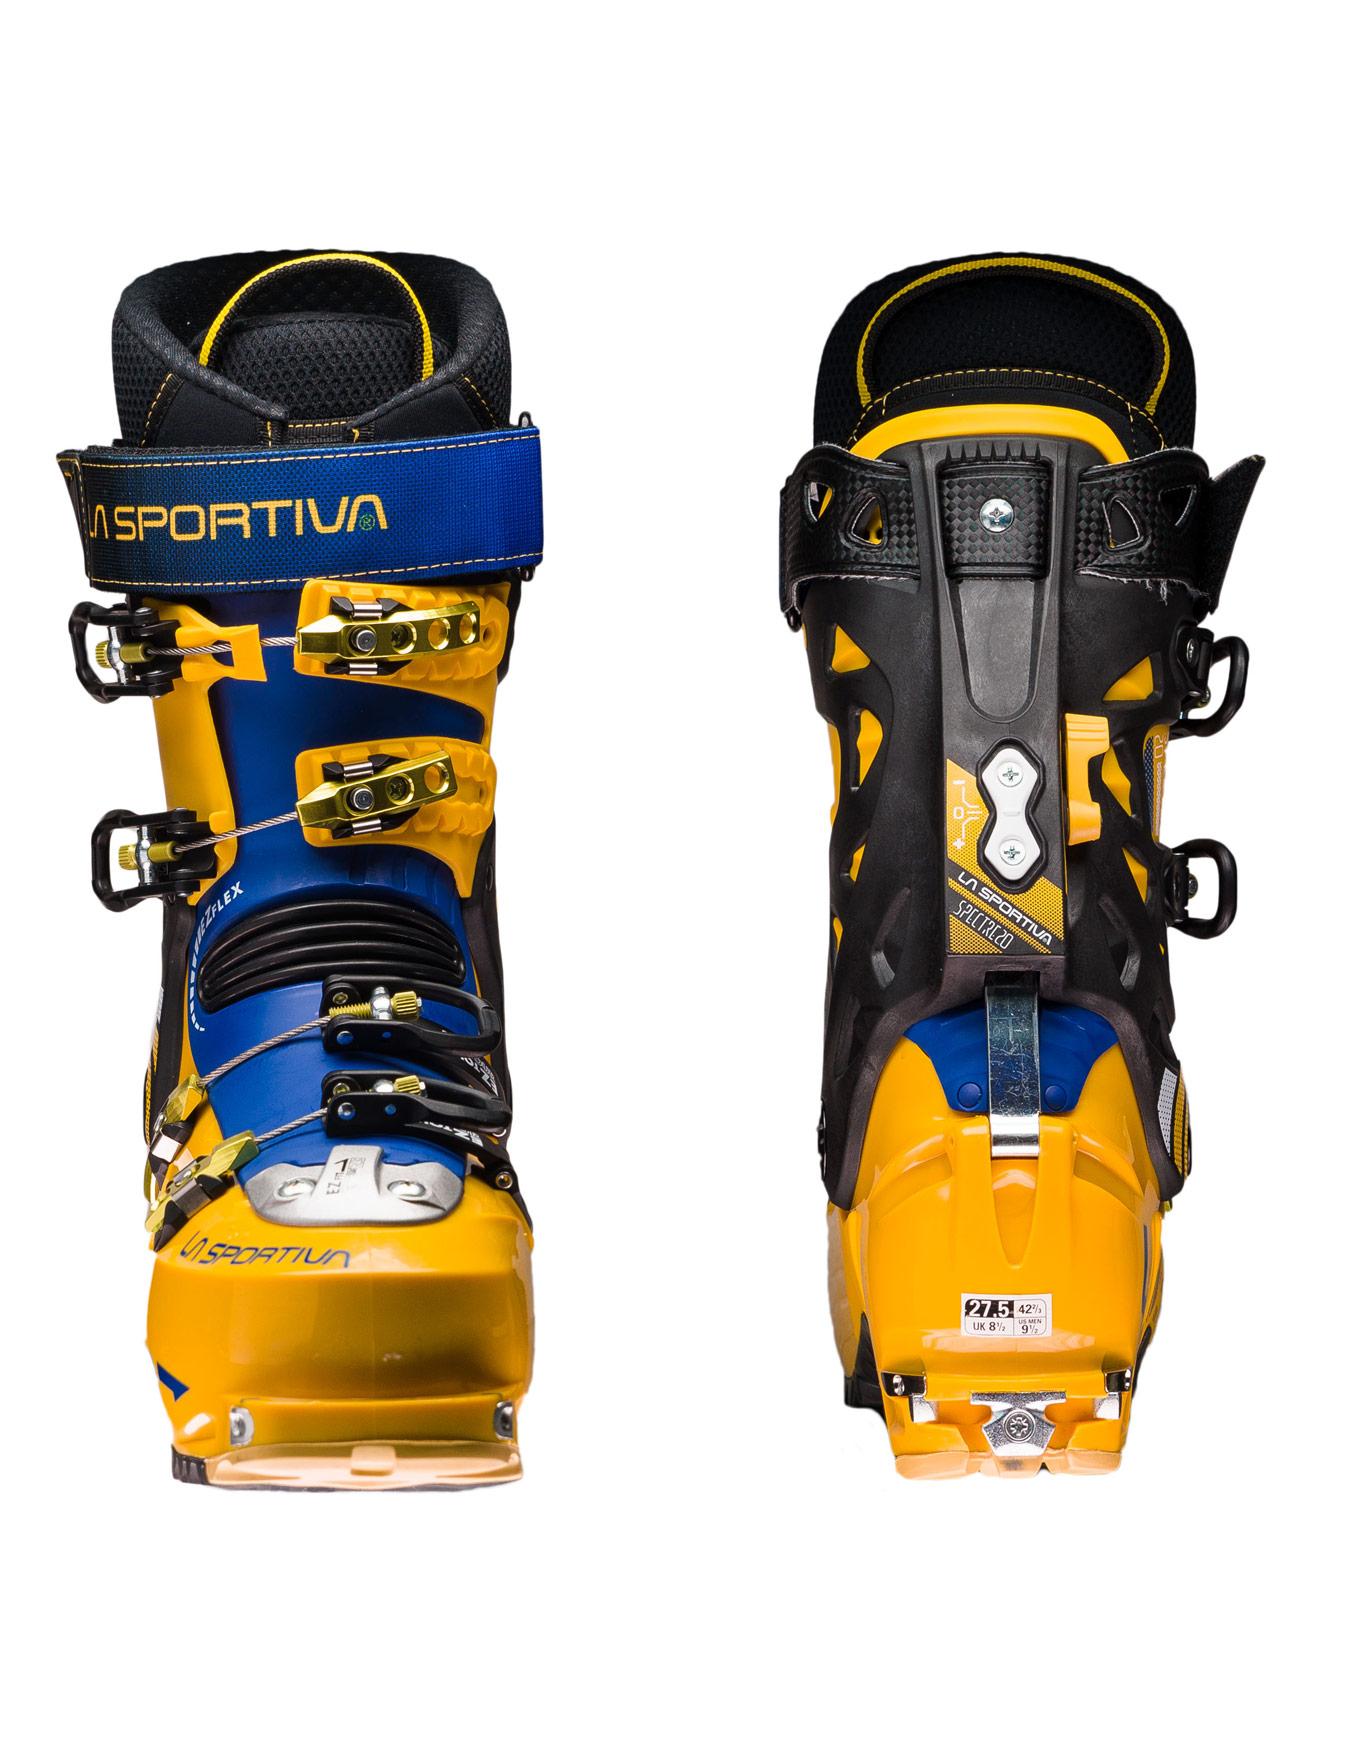 2 Sportiva Ski 0 Chaussures Randonn Spectre Yellowblue La dqBxHw